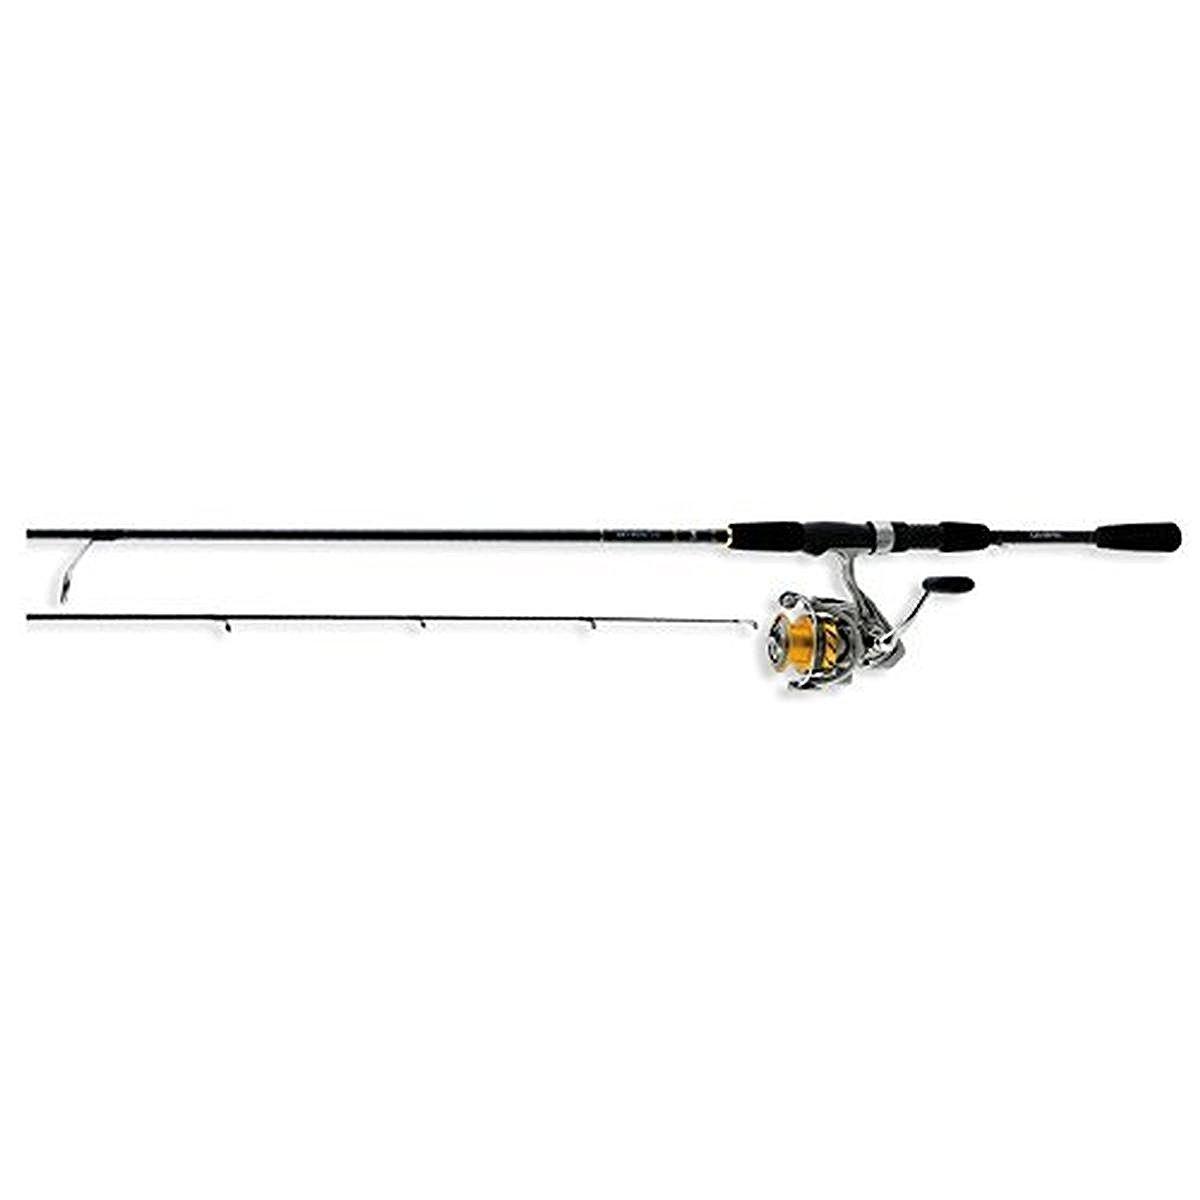 Daiwa REV25-4BI G662ML Revros Freshwater Spinning Combo, 4Rb 1Rb Bearings, 6 6 Length, 2Piece Rod, Medium Light Power